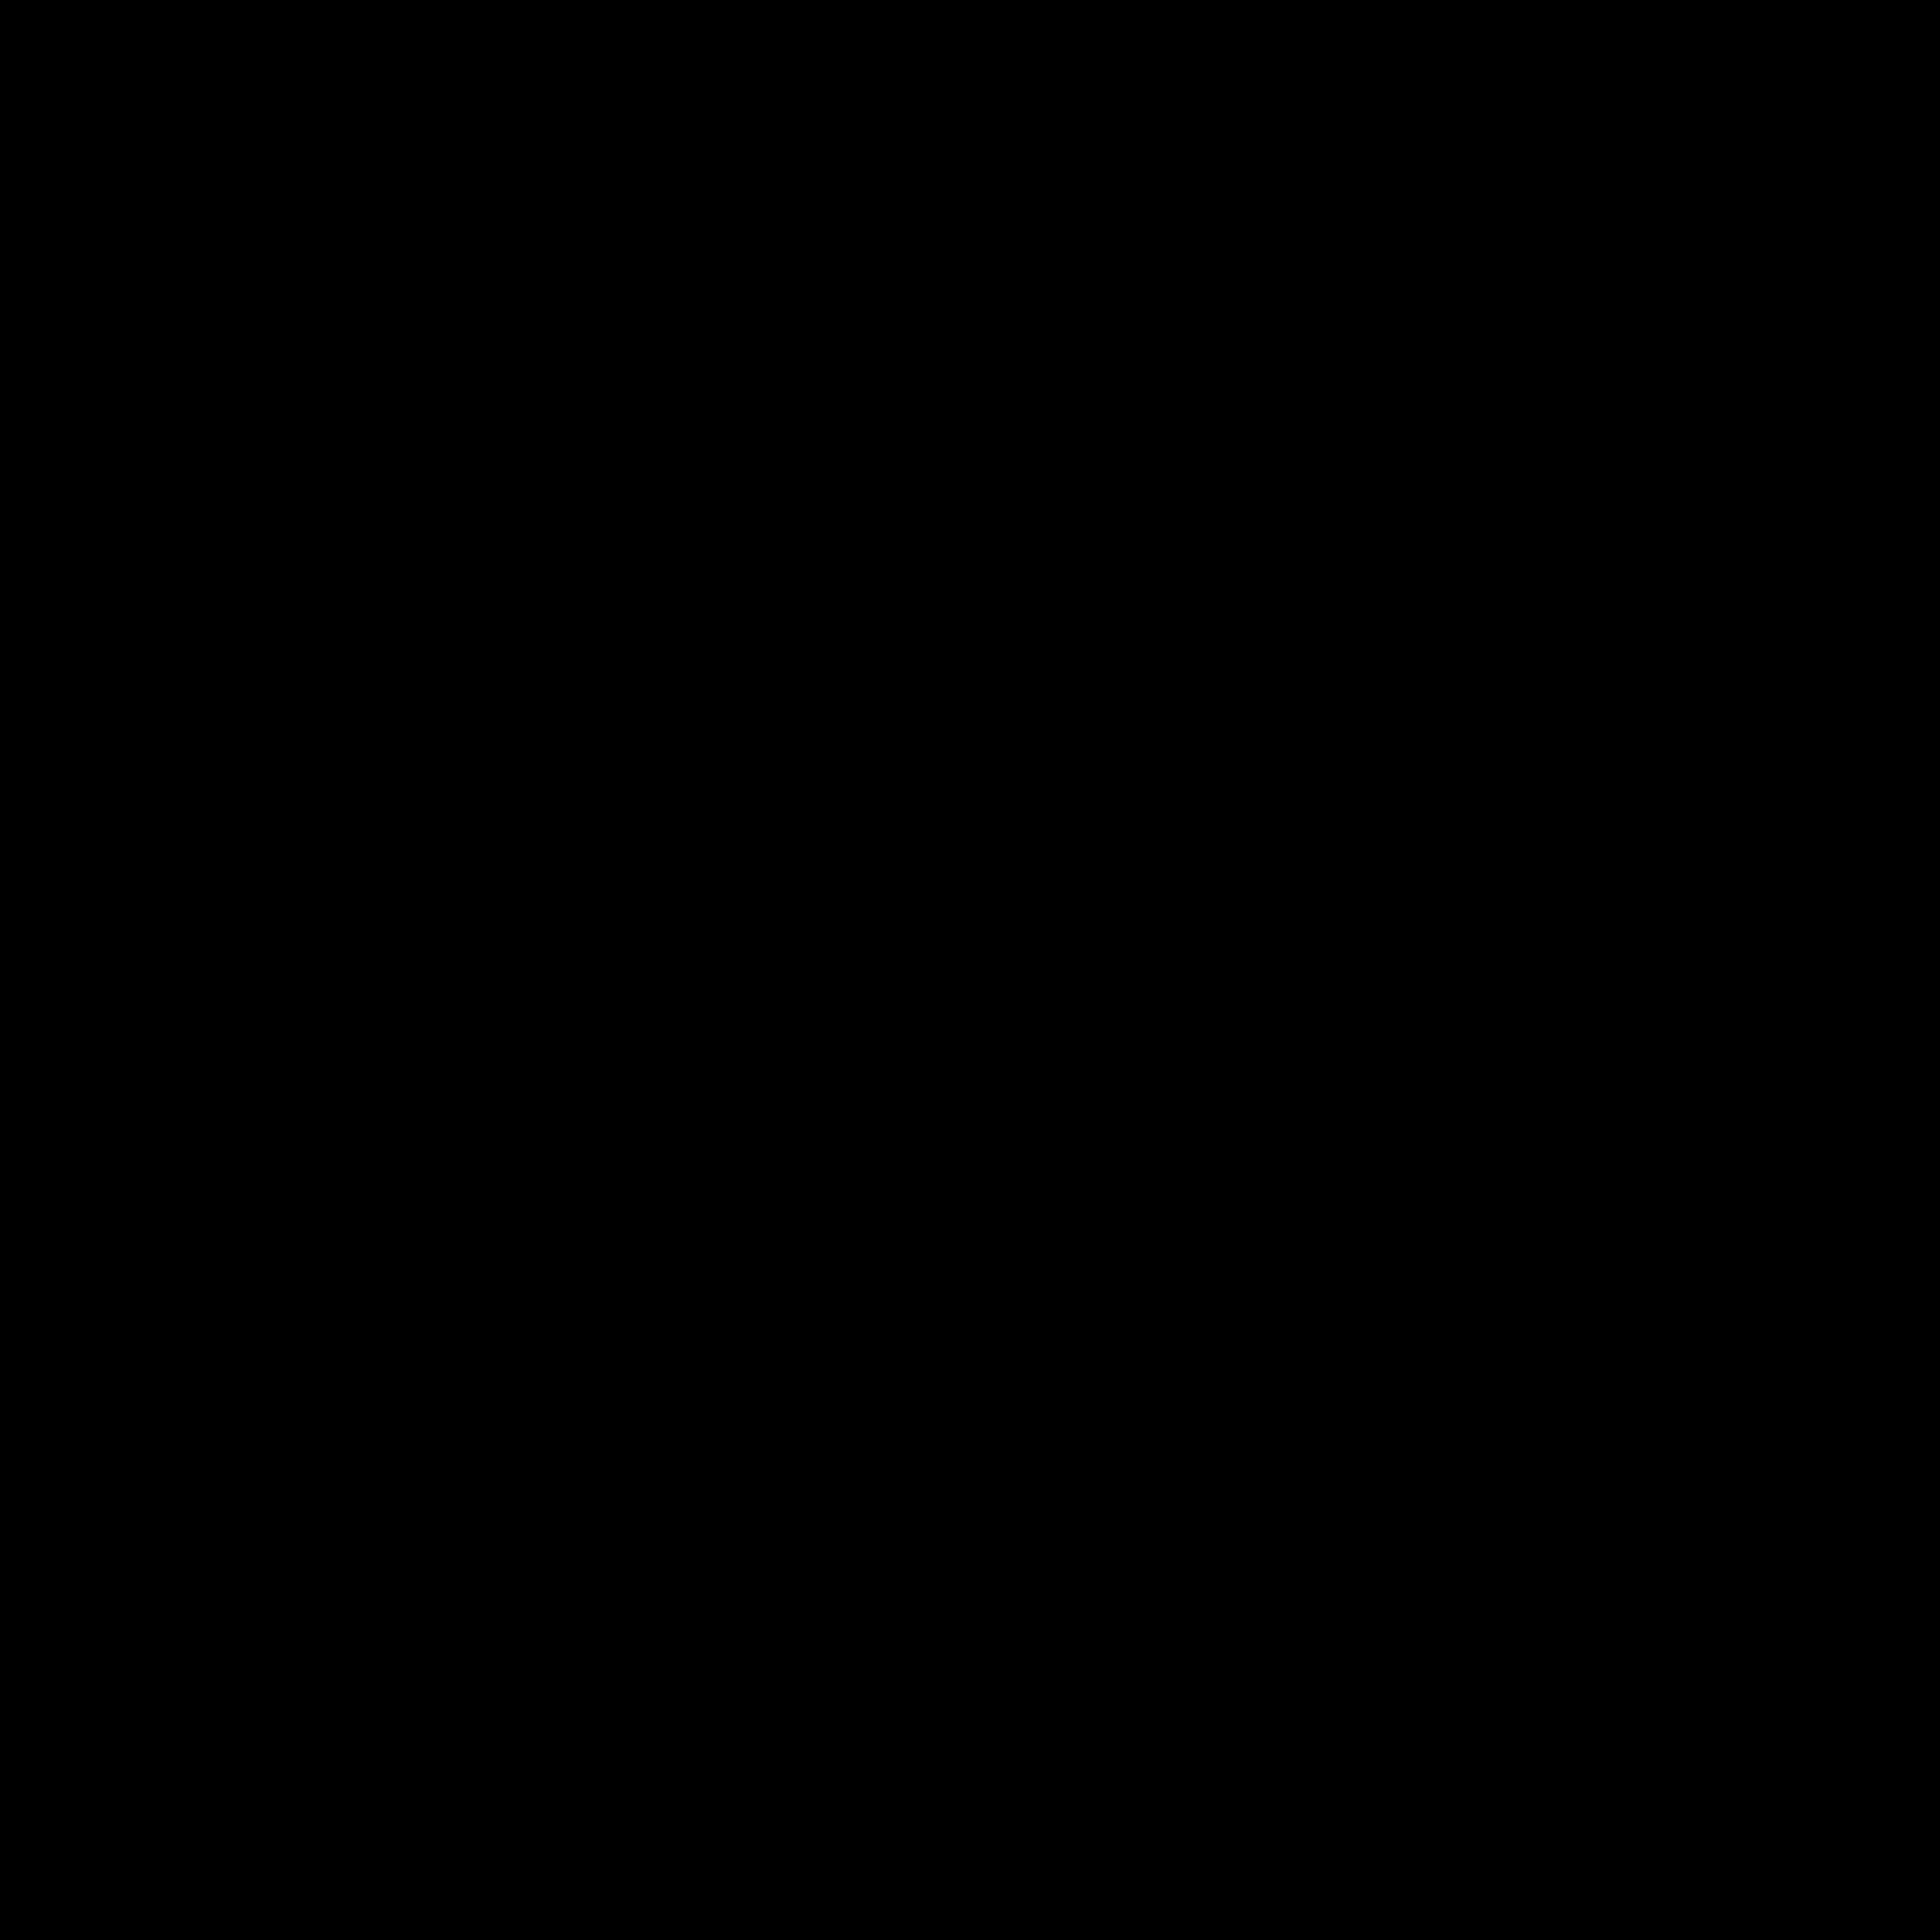 rappibank logo 0 - RappiBank Logo